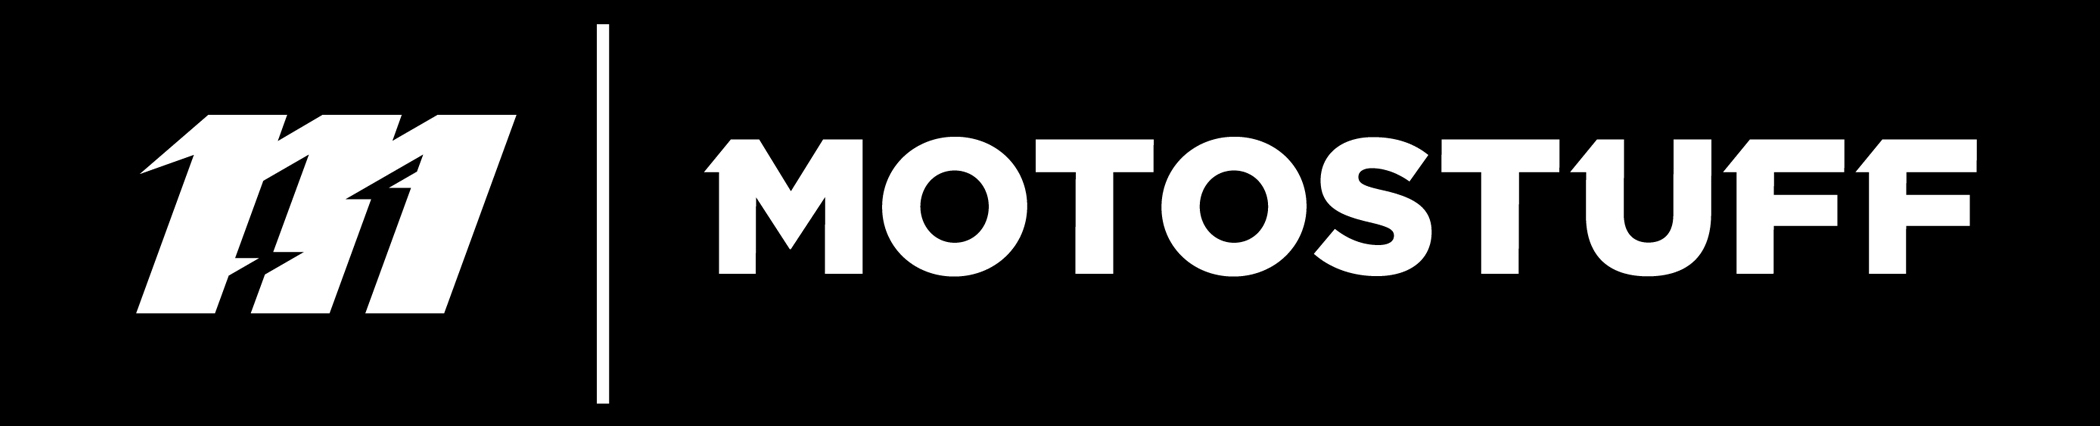 MOTO STUFF slash logo signature .jpg